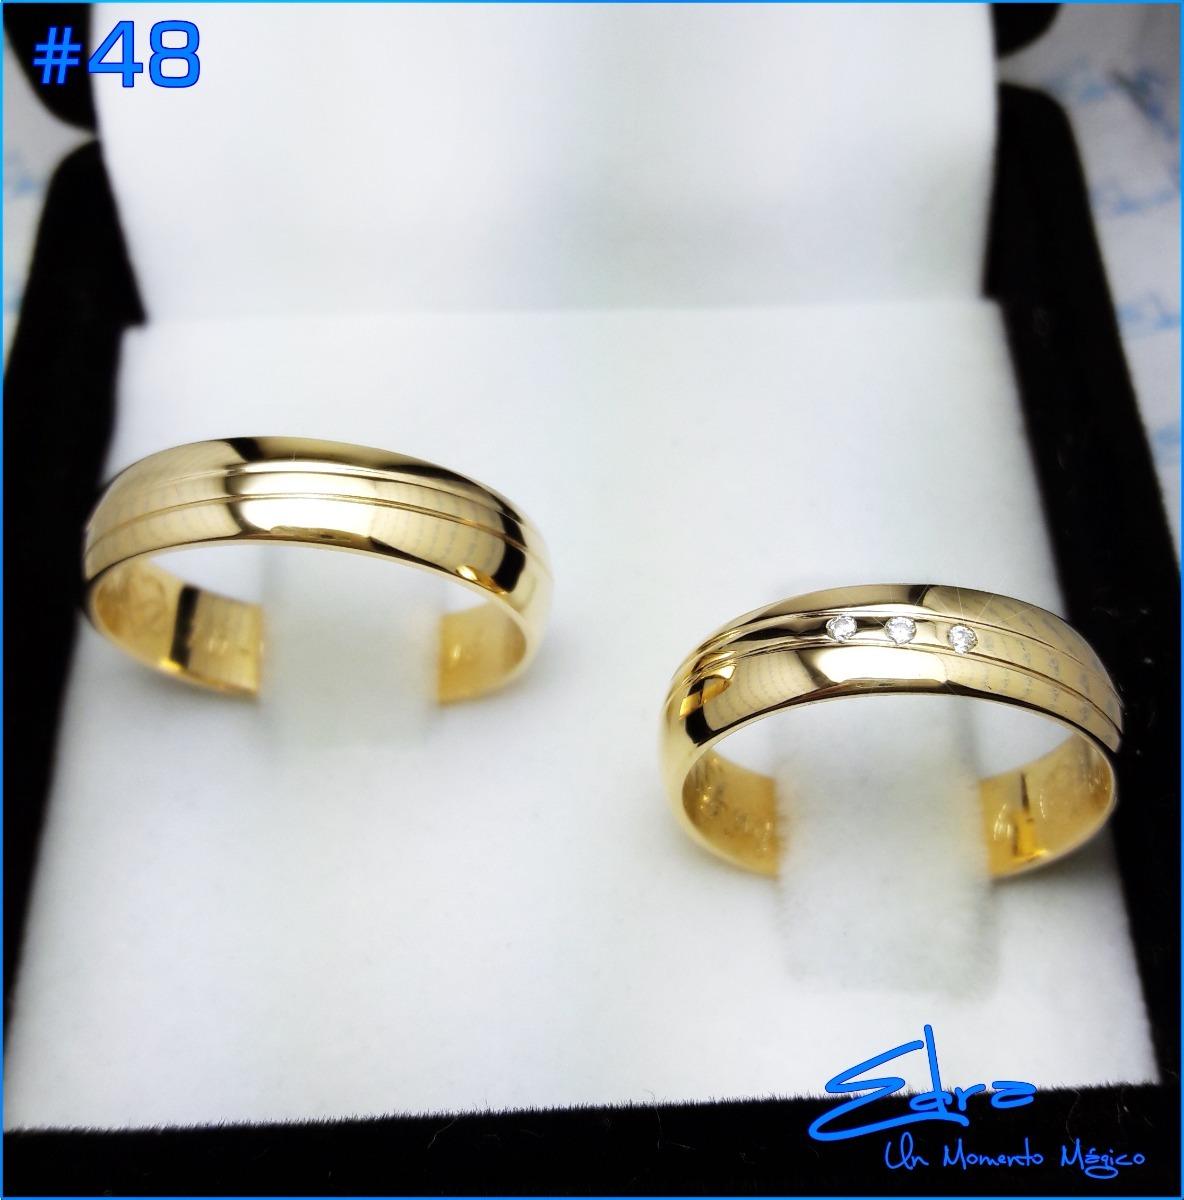 b1b2d1f10525 Argollas Matrimonio O Compromiso Oro 18k Macizo C u -   859.000 en ...